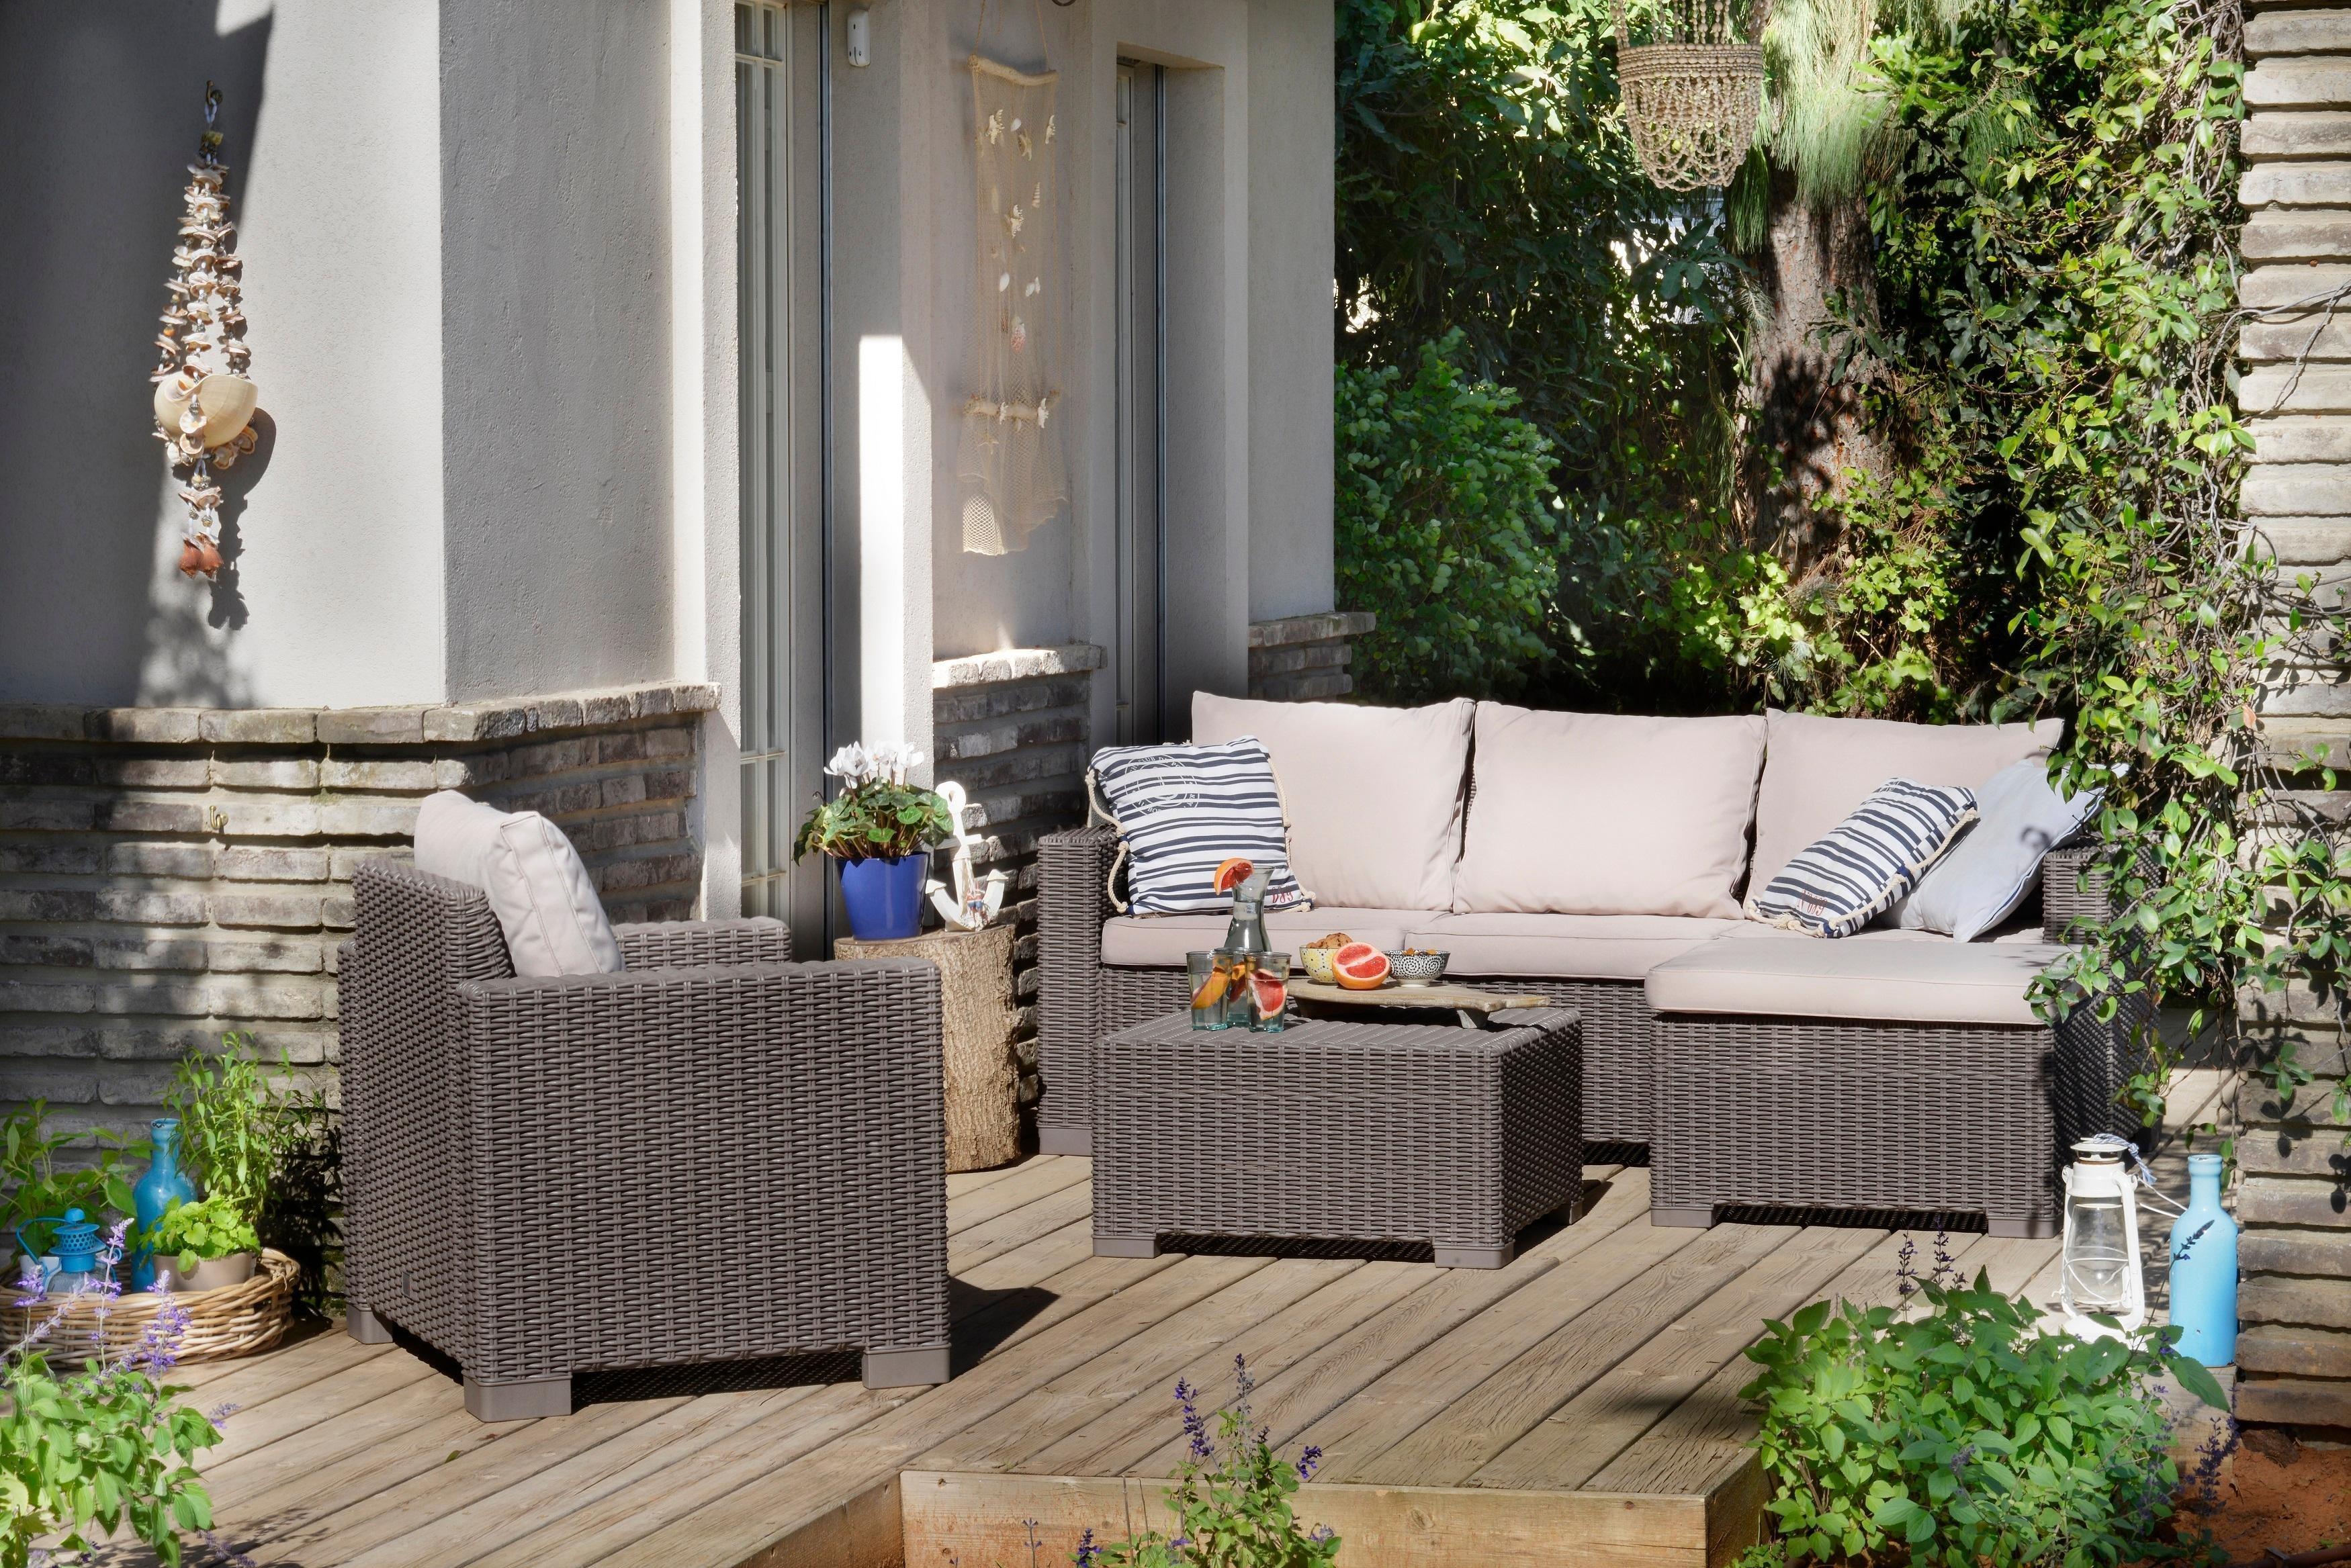 Allibert by keter moorea 5 seater rattan lounge outdoor for Sofas de ratan para jardin